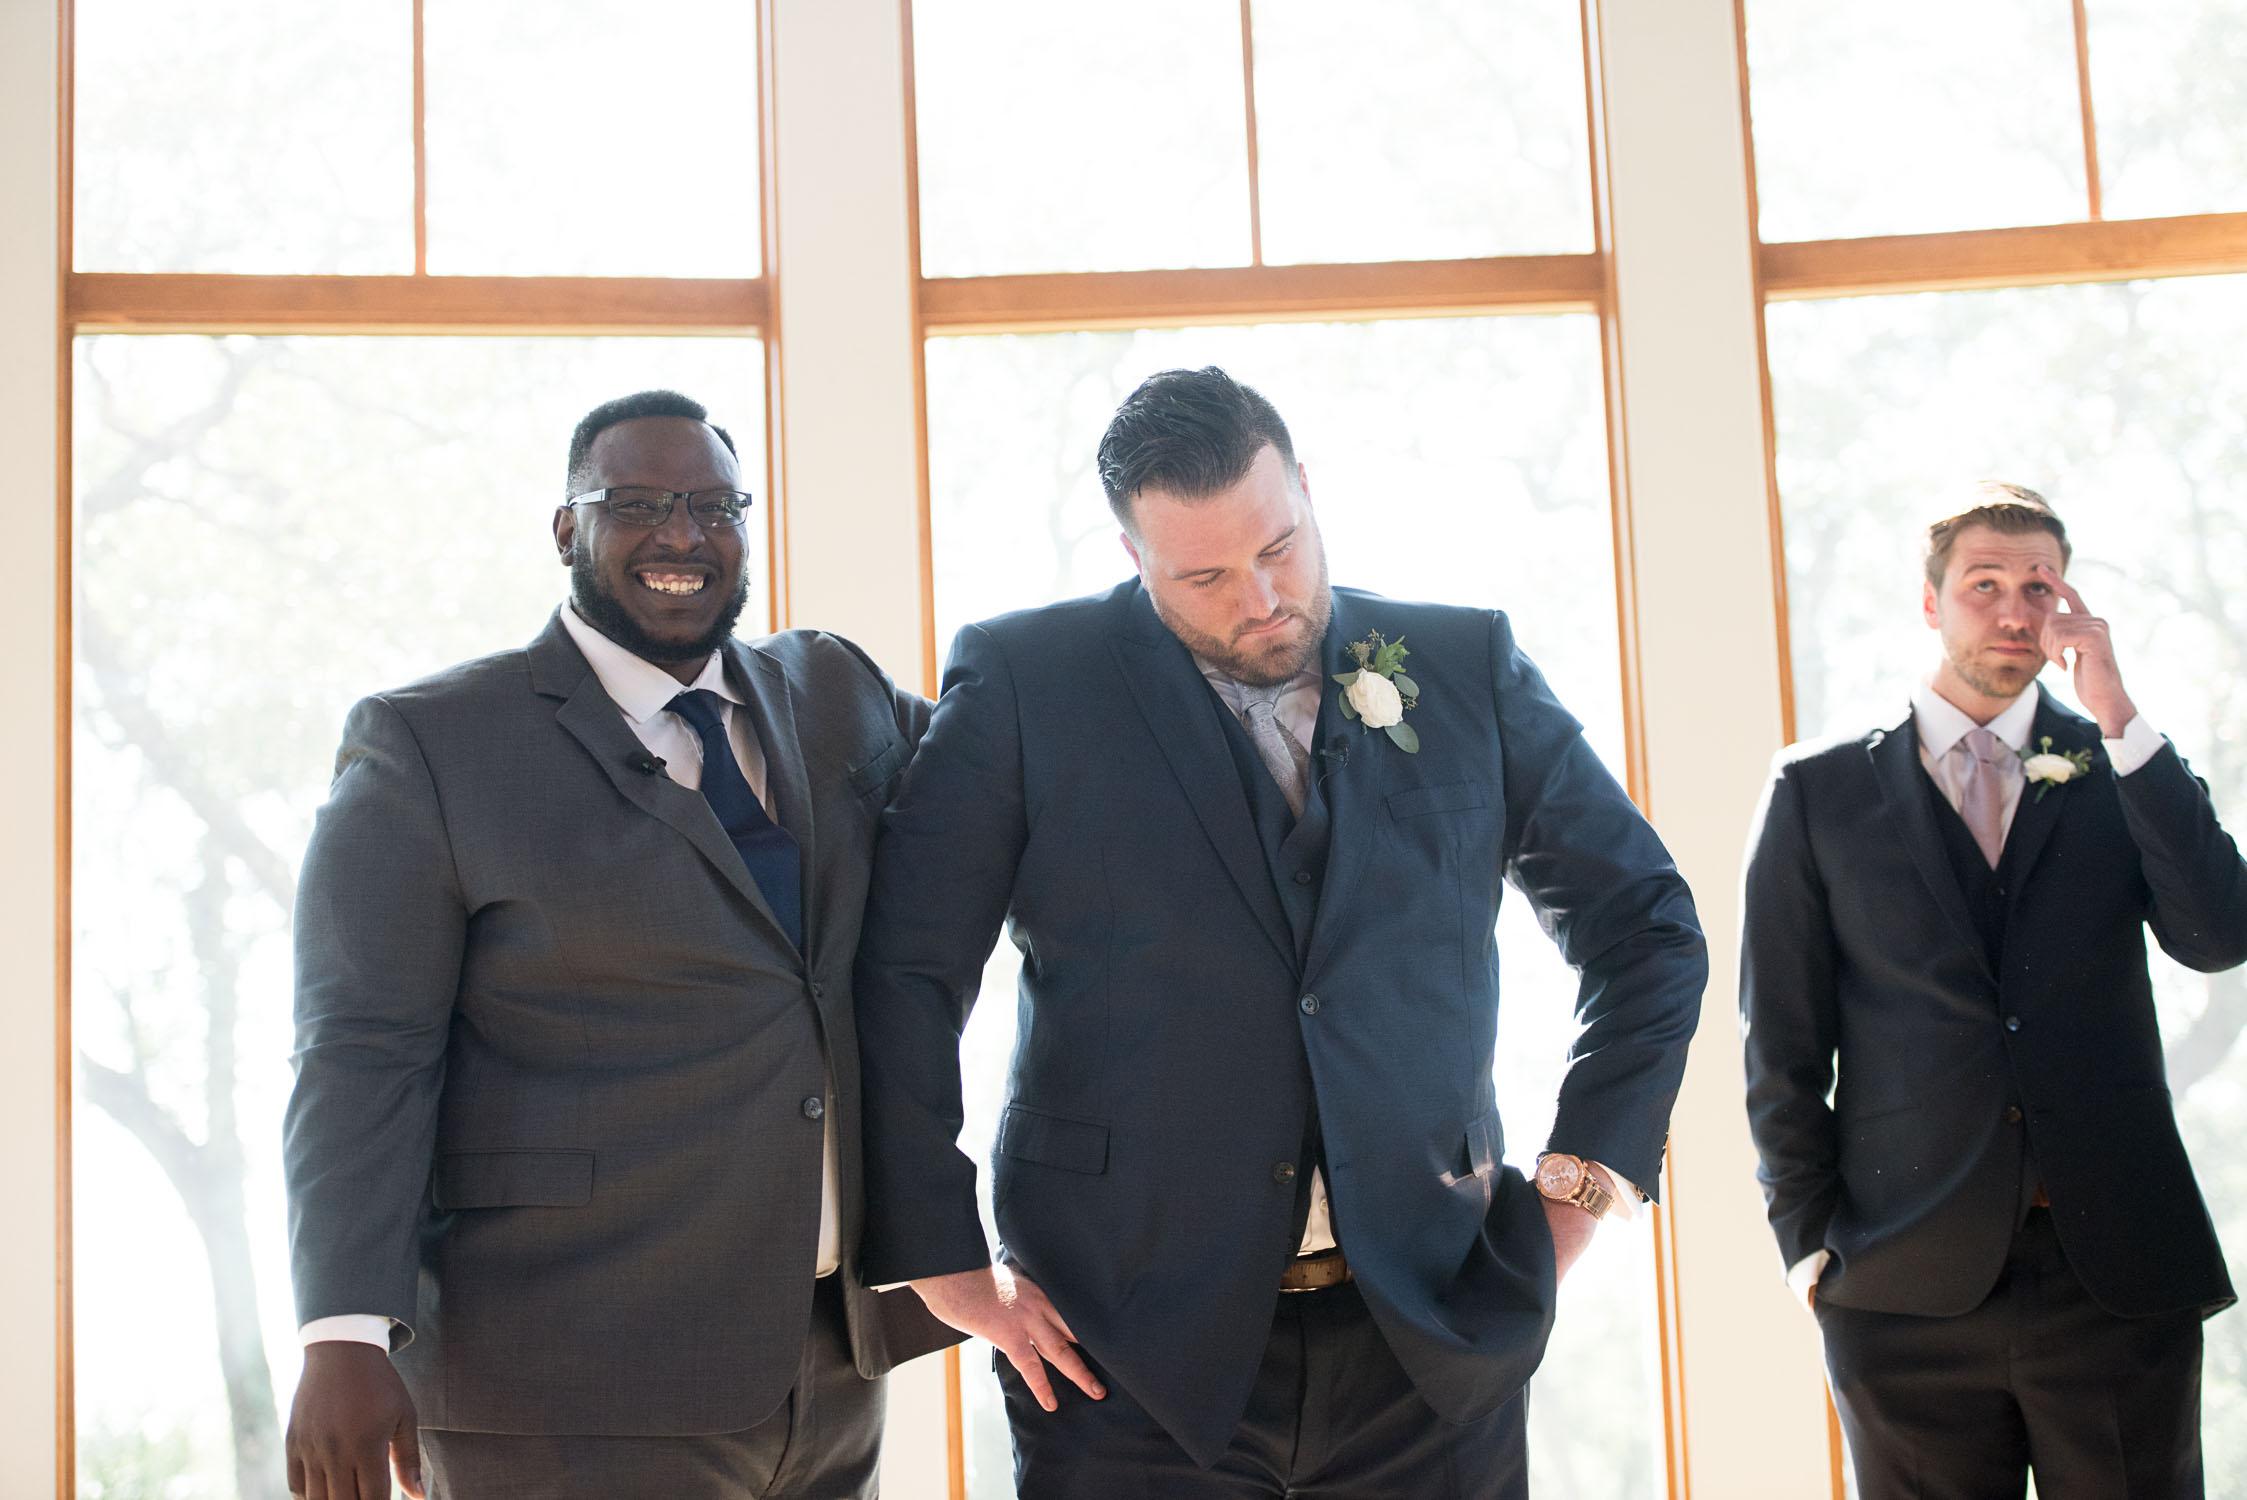 Hinton Wedding at Canyonwood Ridge Dripping Springs Texas Wedding Photography-88.jpg